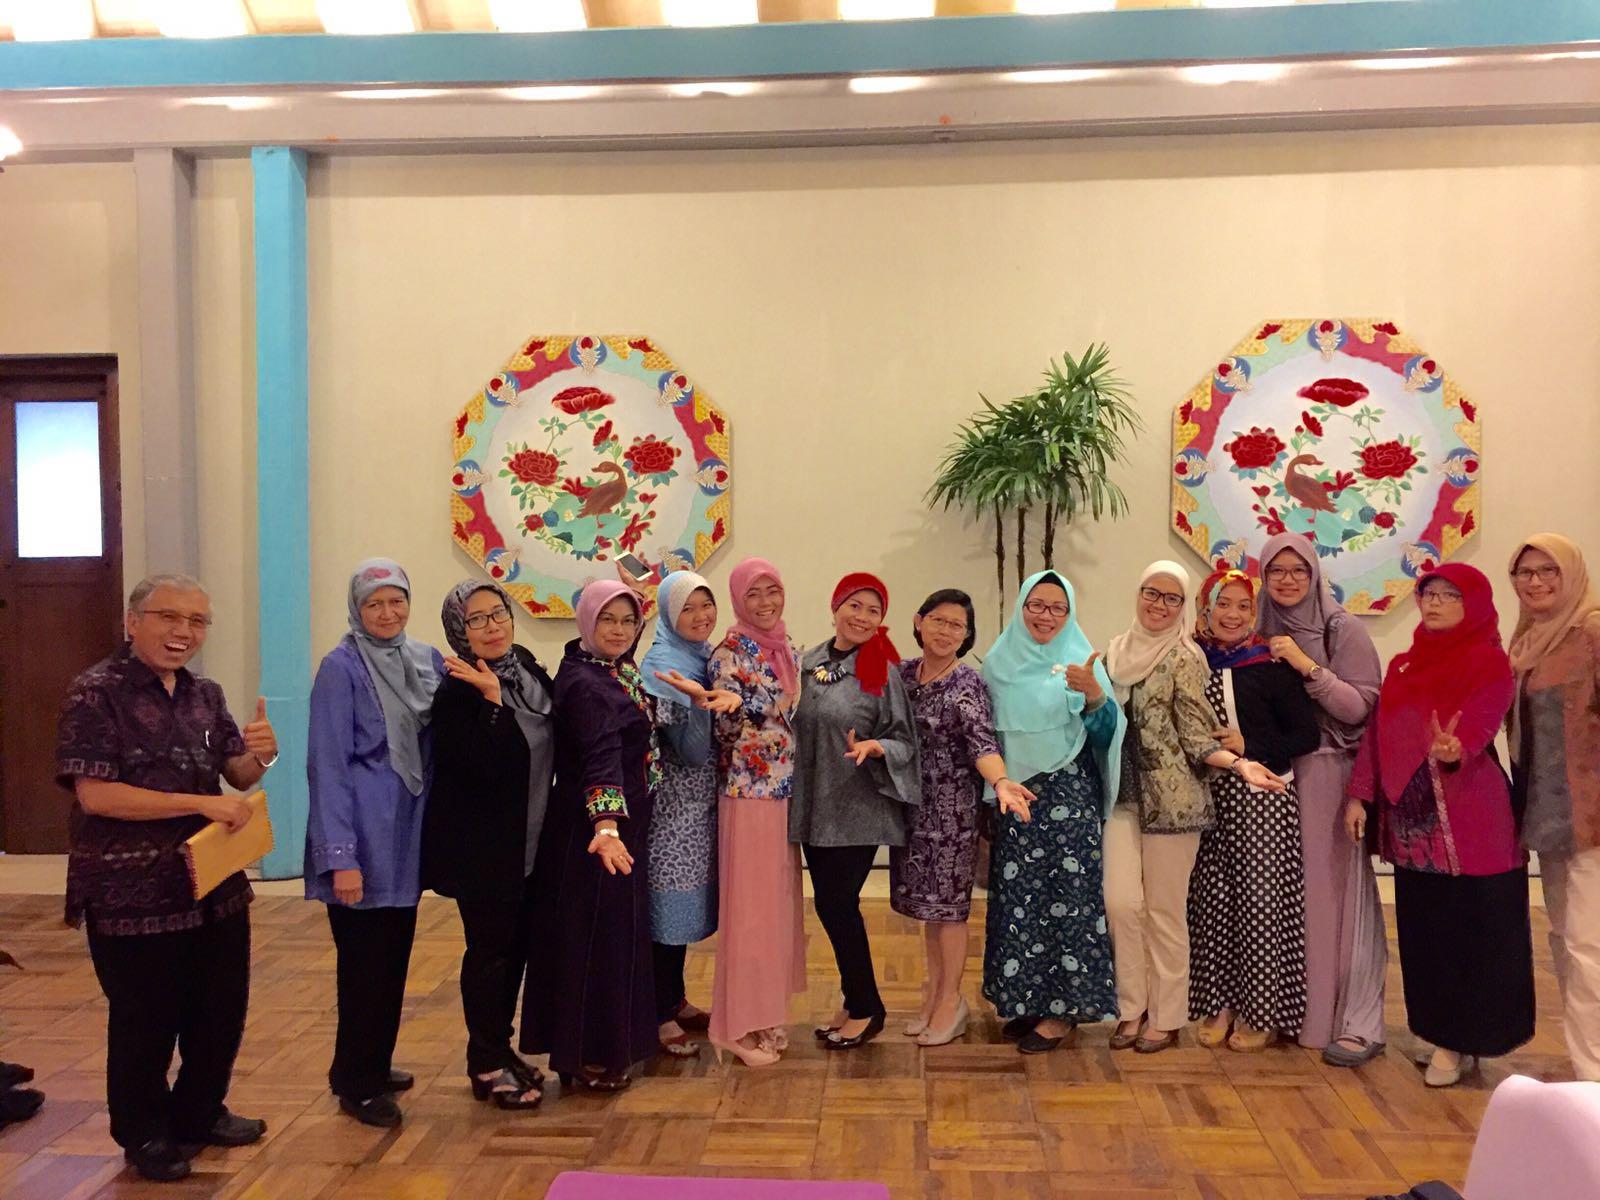 (Indonesia) Rapat Evaluasi Perkuliahan Semester Ganjil dan Persiapan Perkuliahan Semester Genap Tahun Ajaran 2015/2016